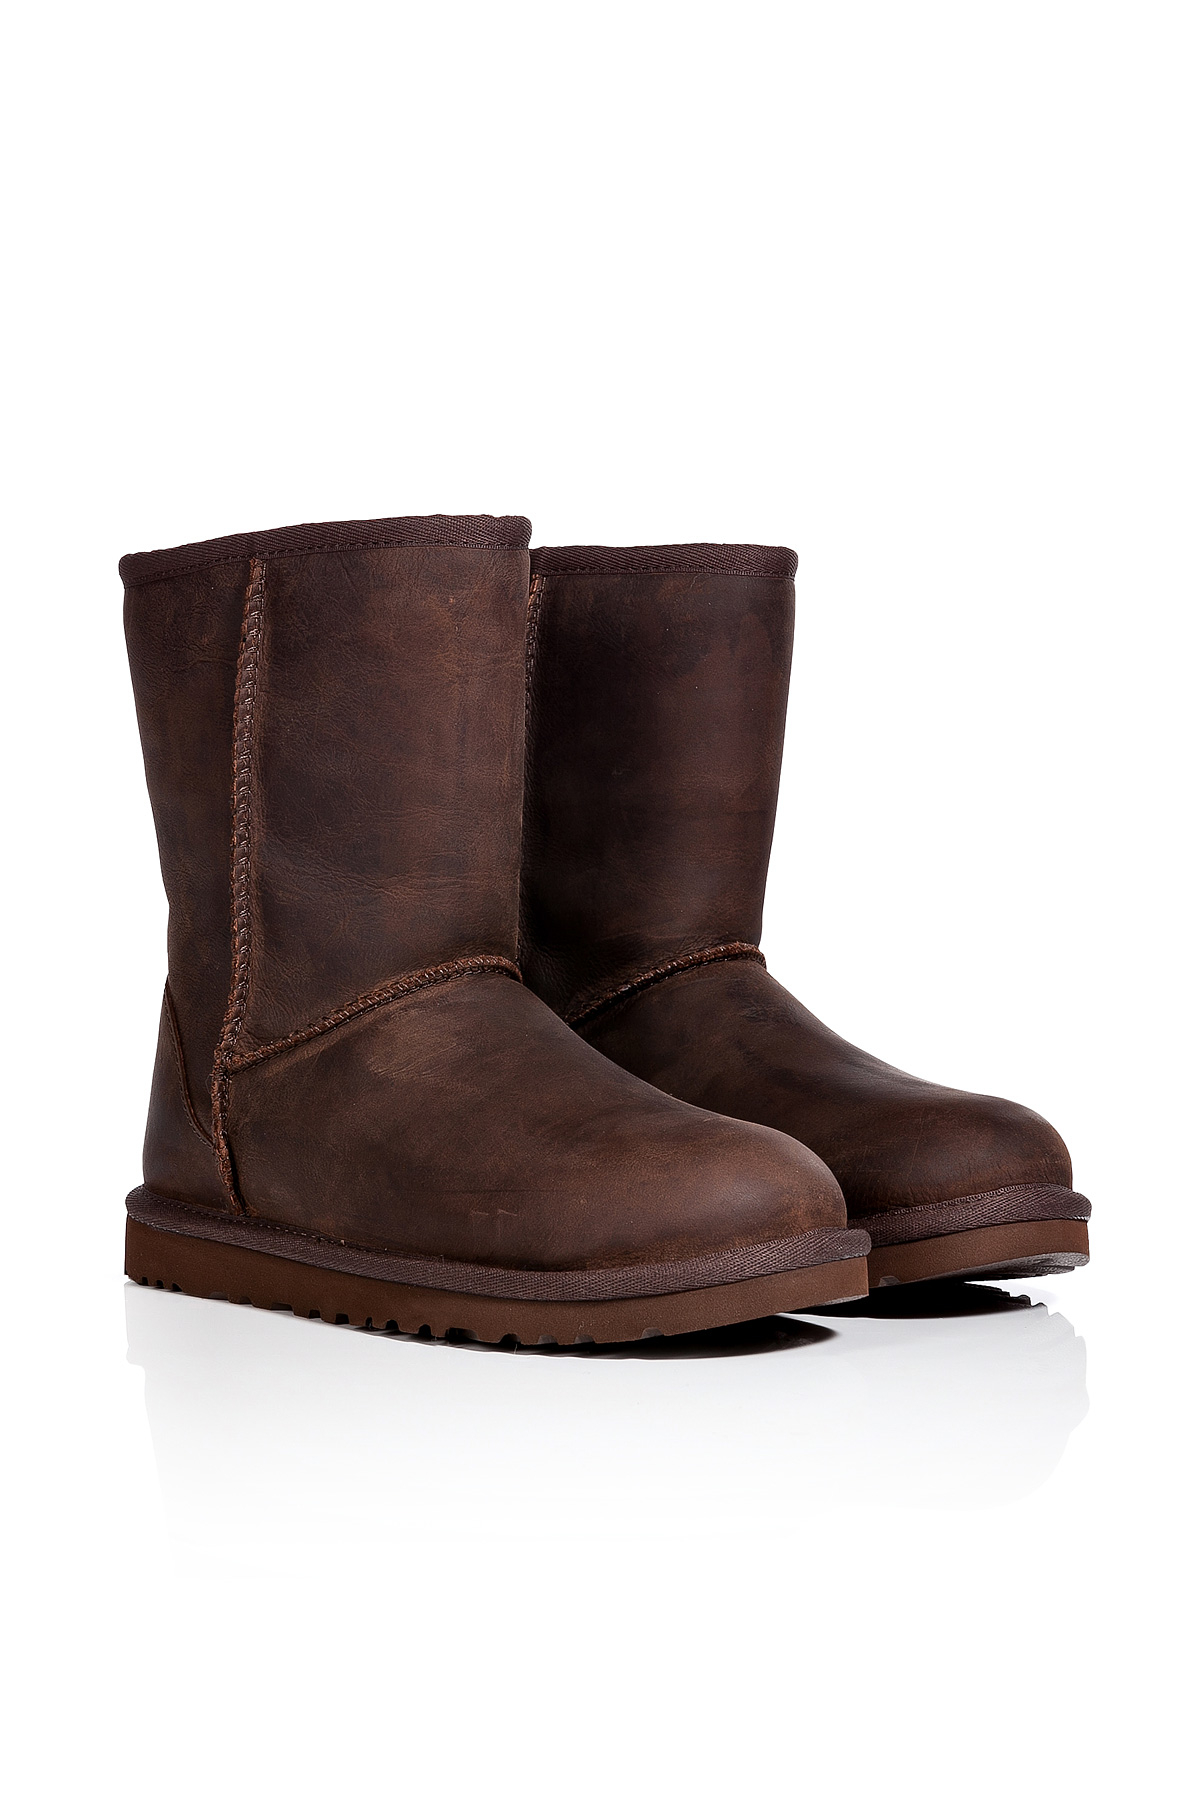 how to wear dark brown short boots